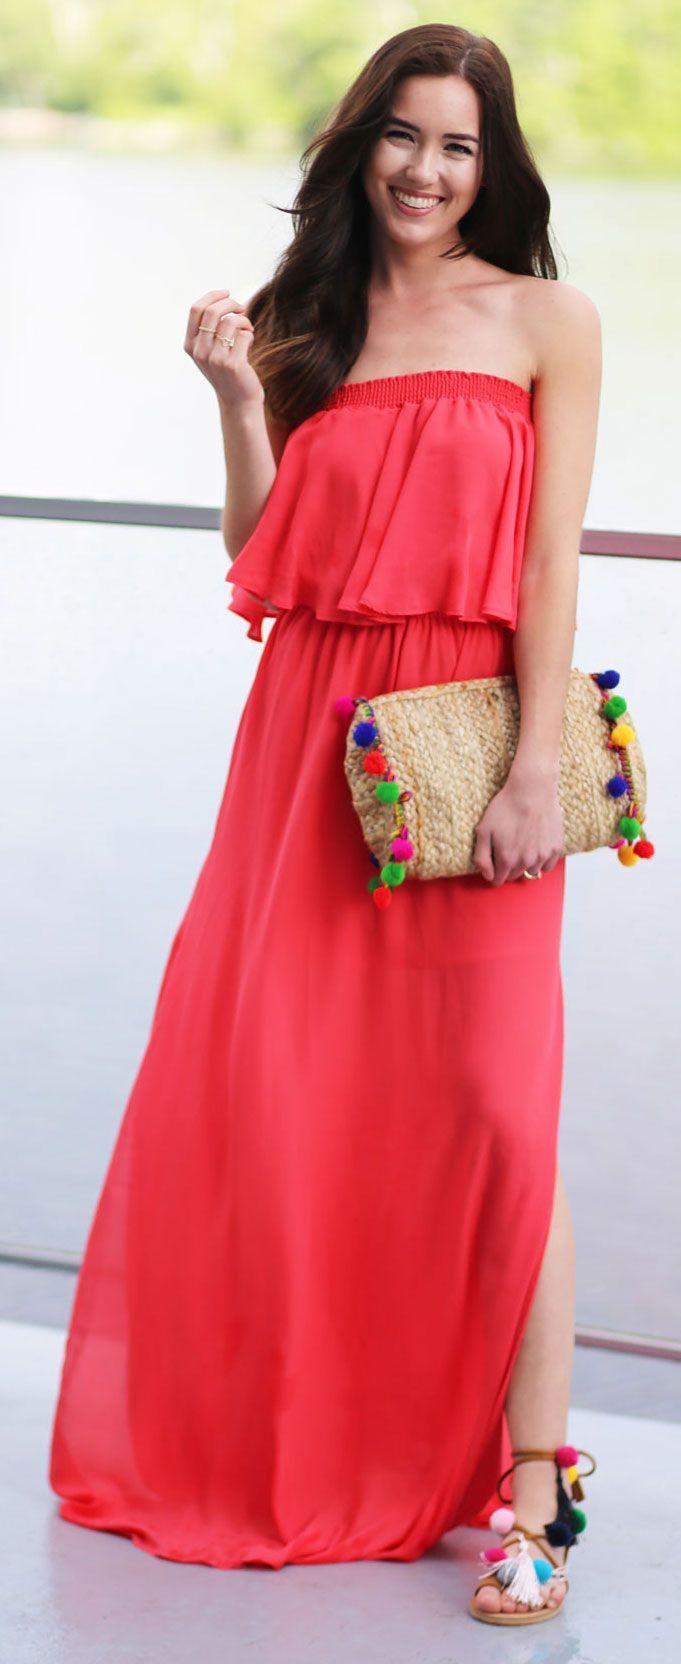 The prettiest orangered maxi summer dress can be worn strapless